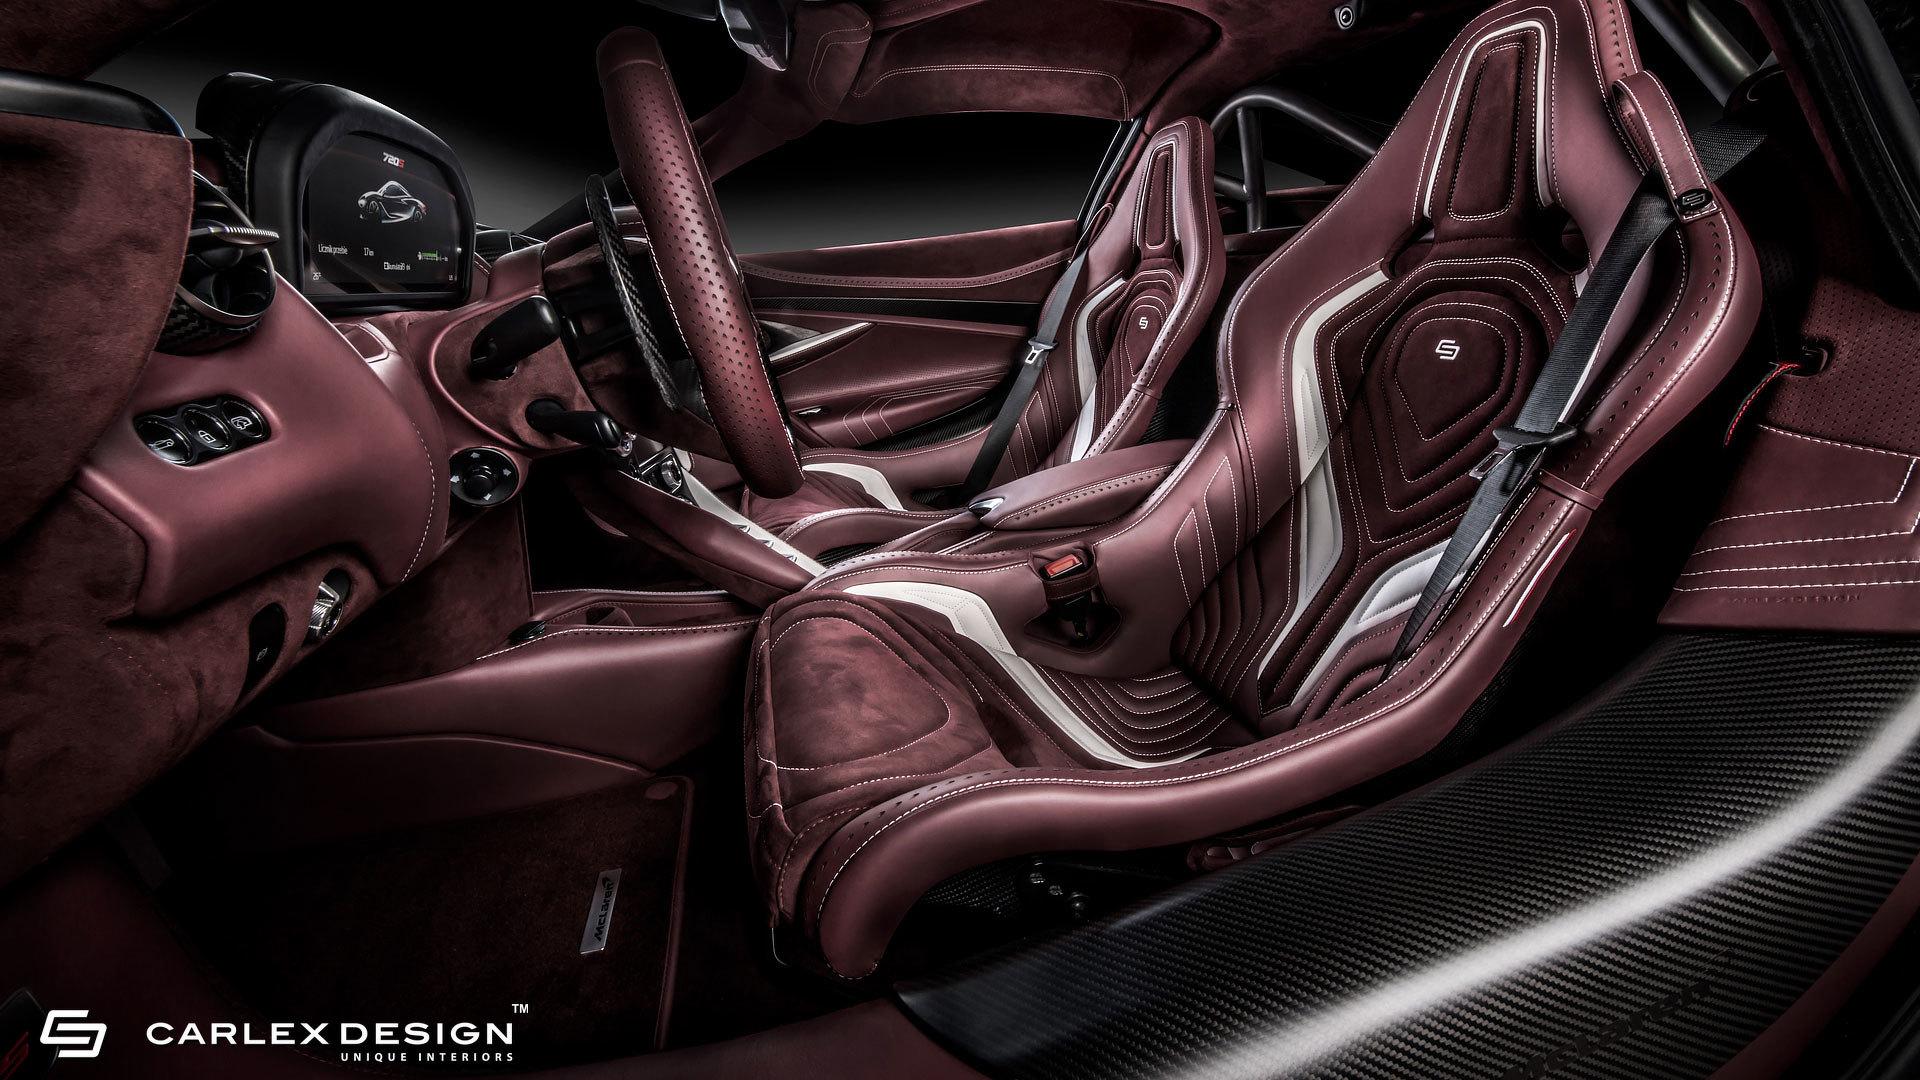 mclaren-720s-by-carlex-design (10)